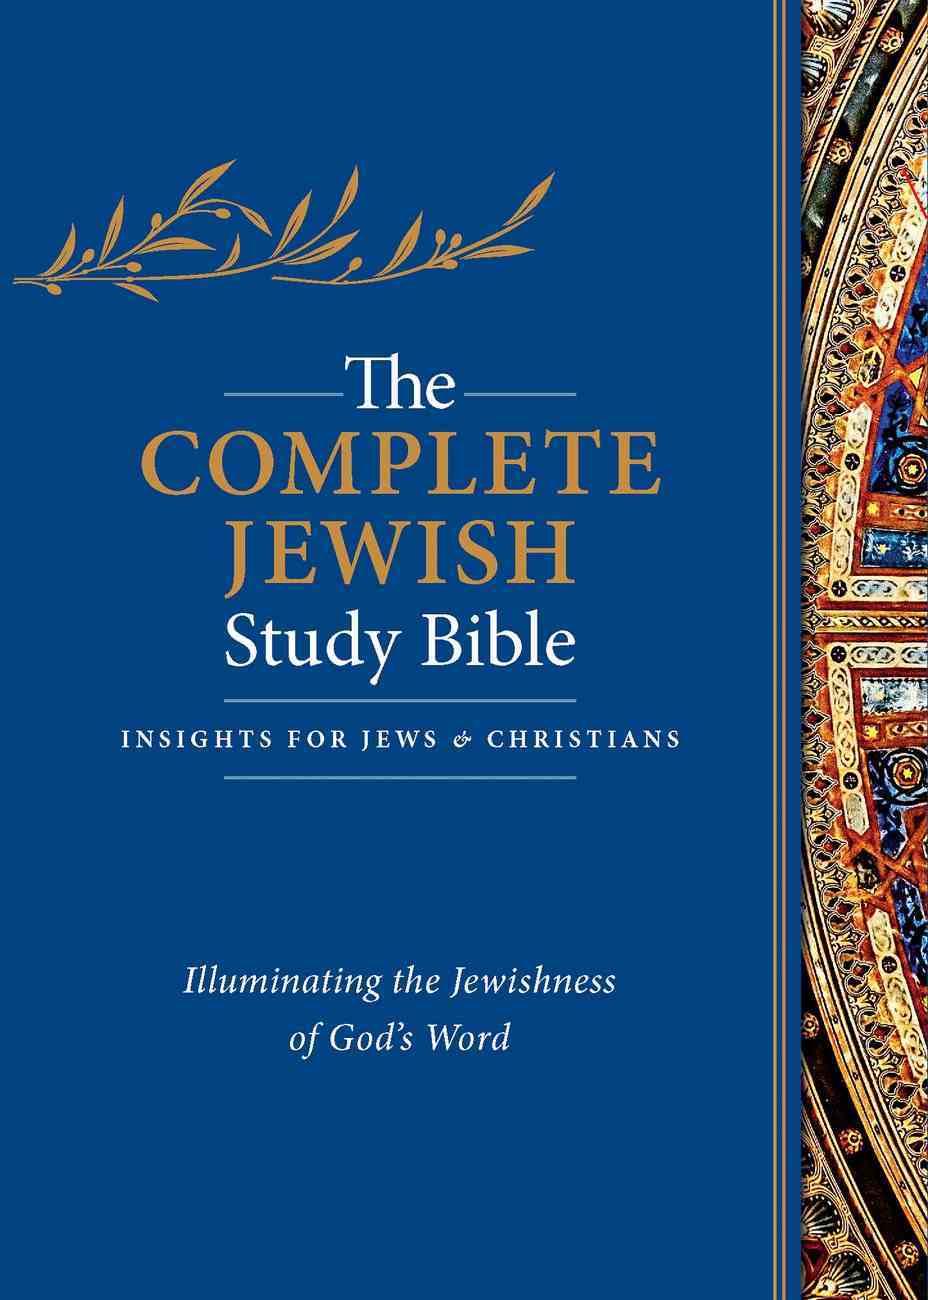 Complete Jewish Study Bible, the Black Genuine Leather